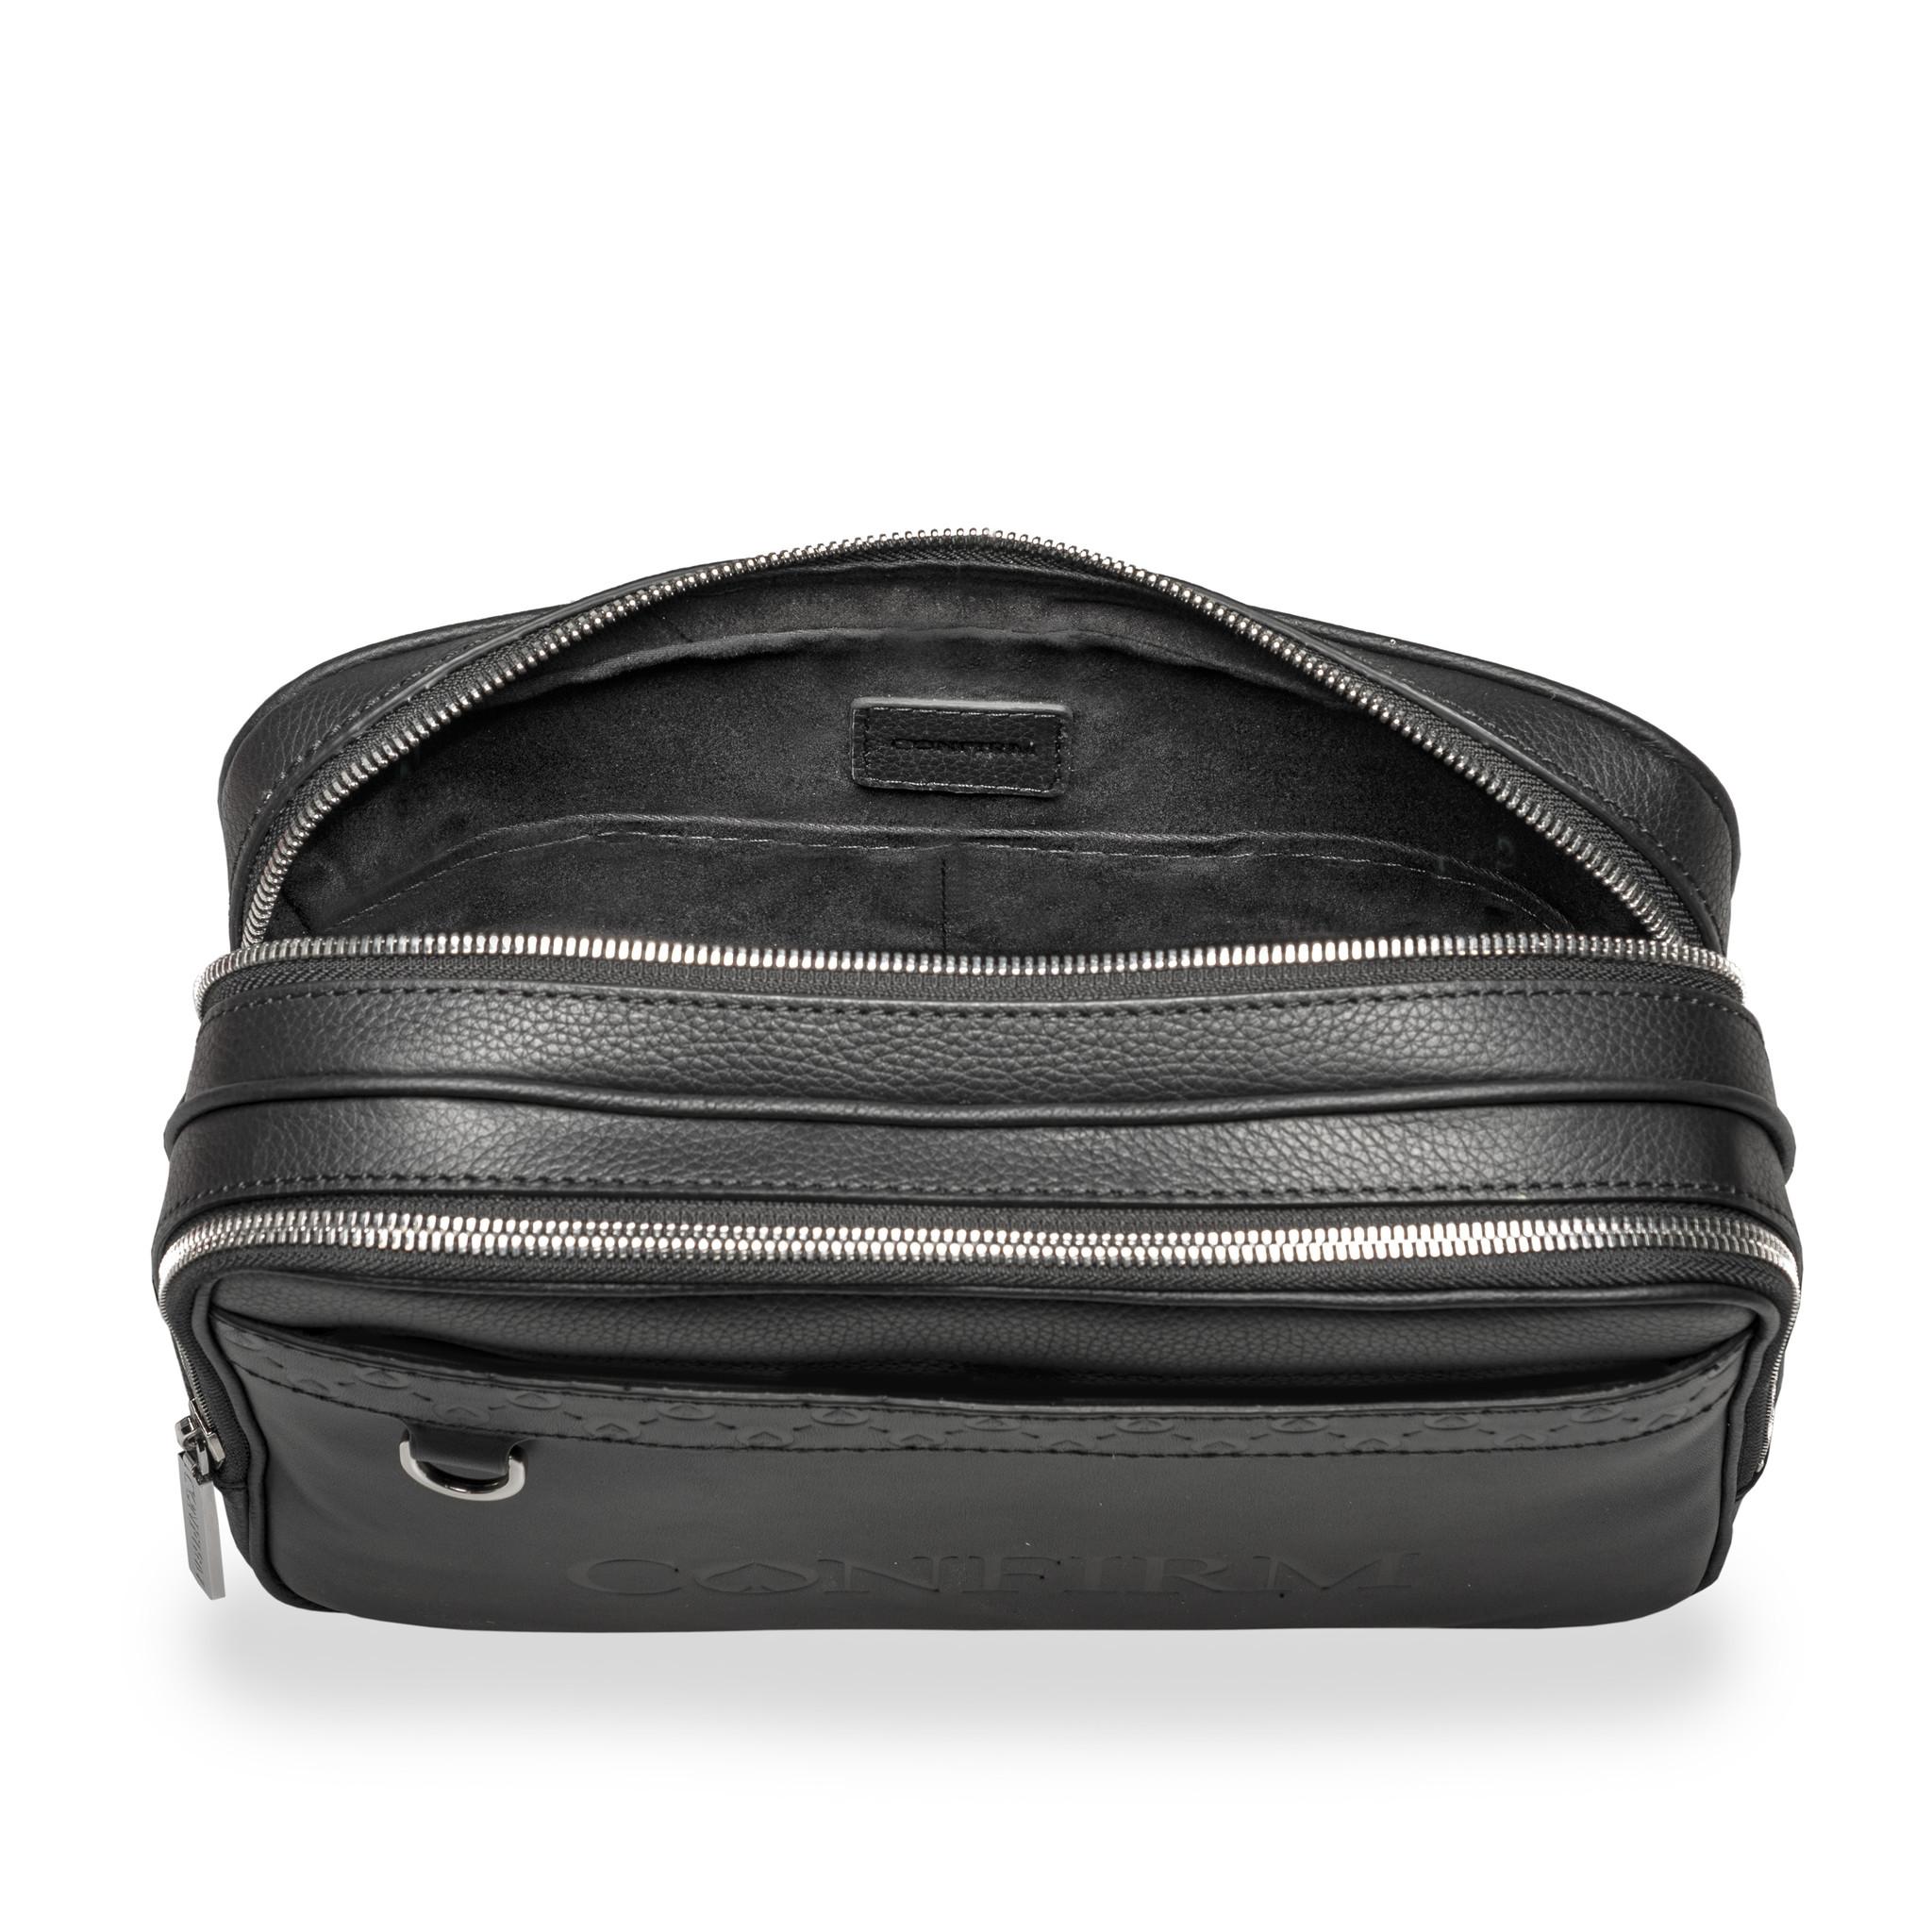 Confirm messenger bag Humero - smooth-6